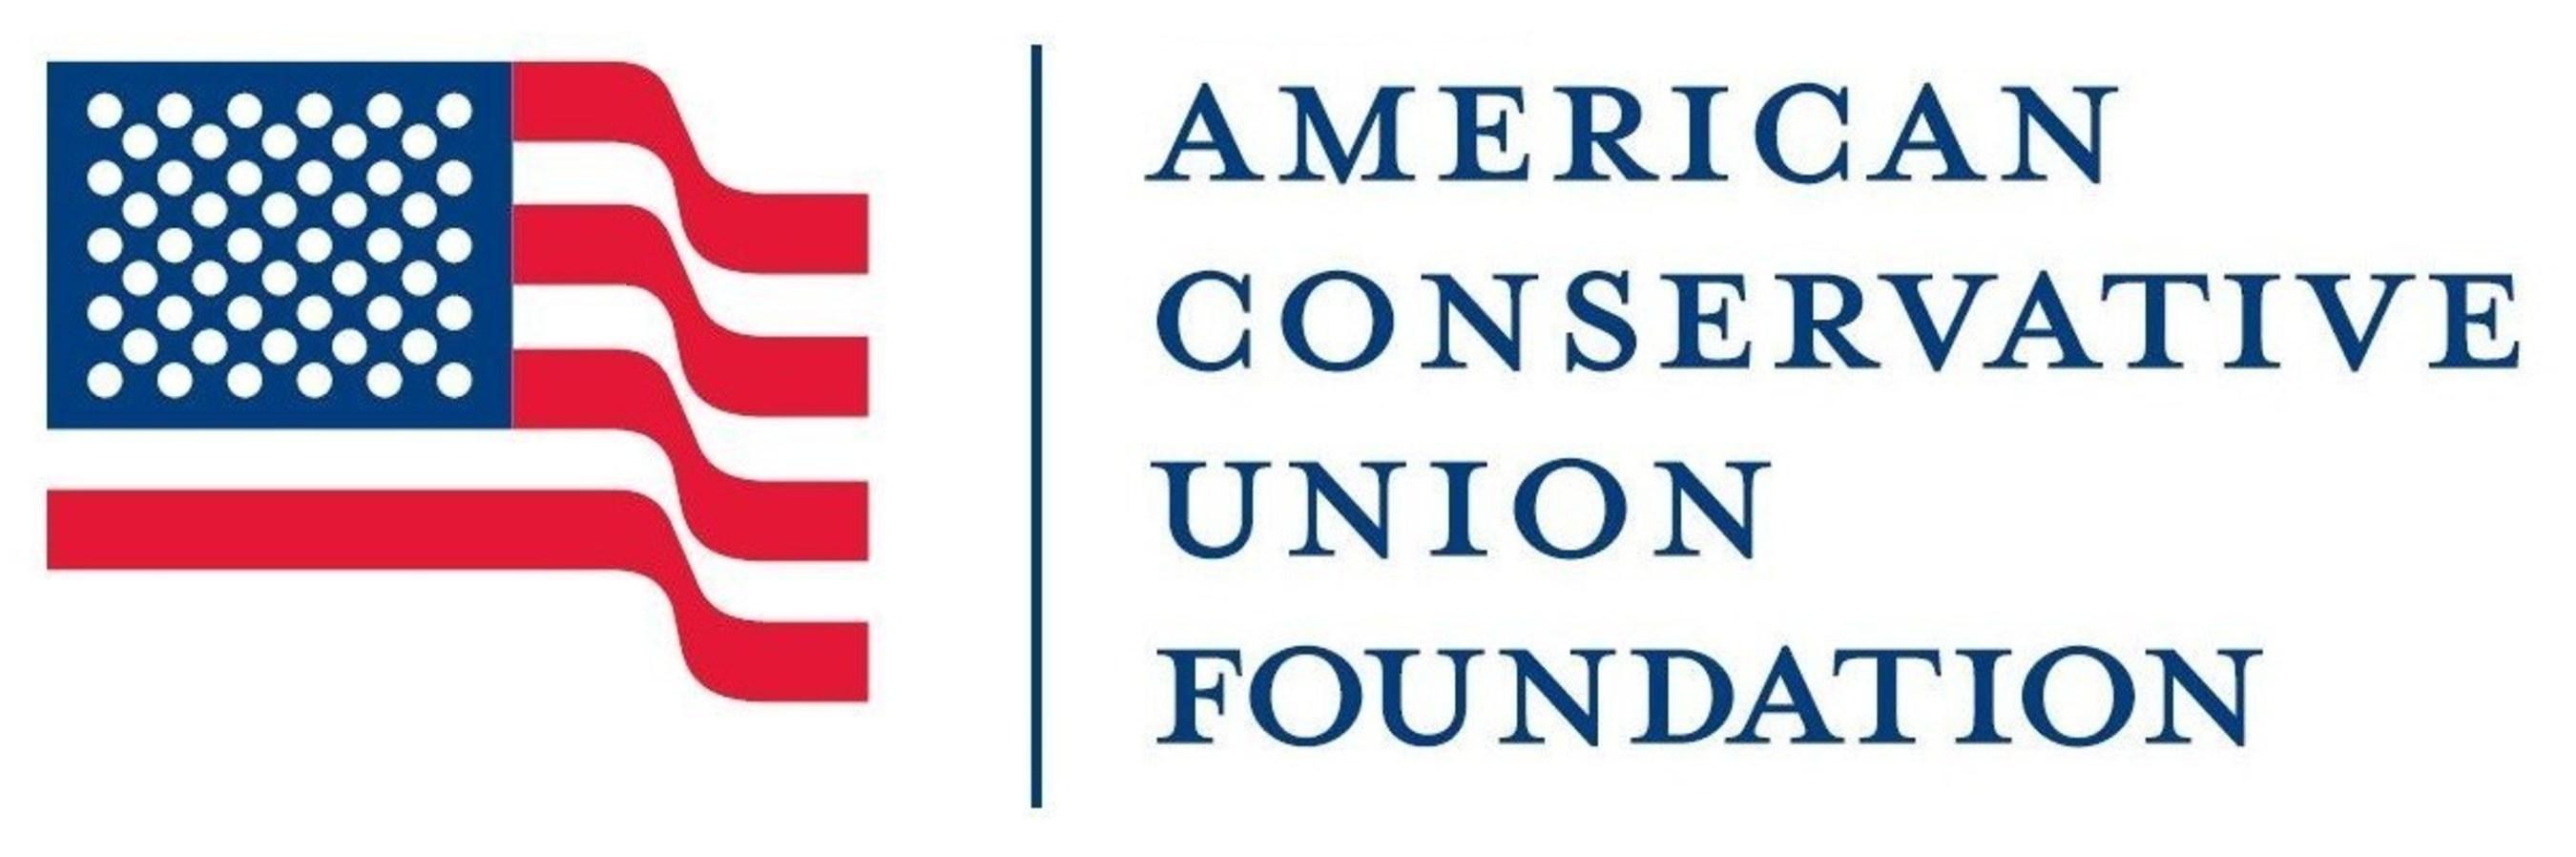 American Conservative Union Foundation logo